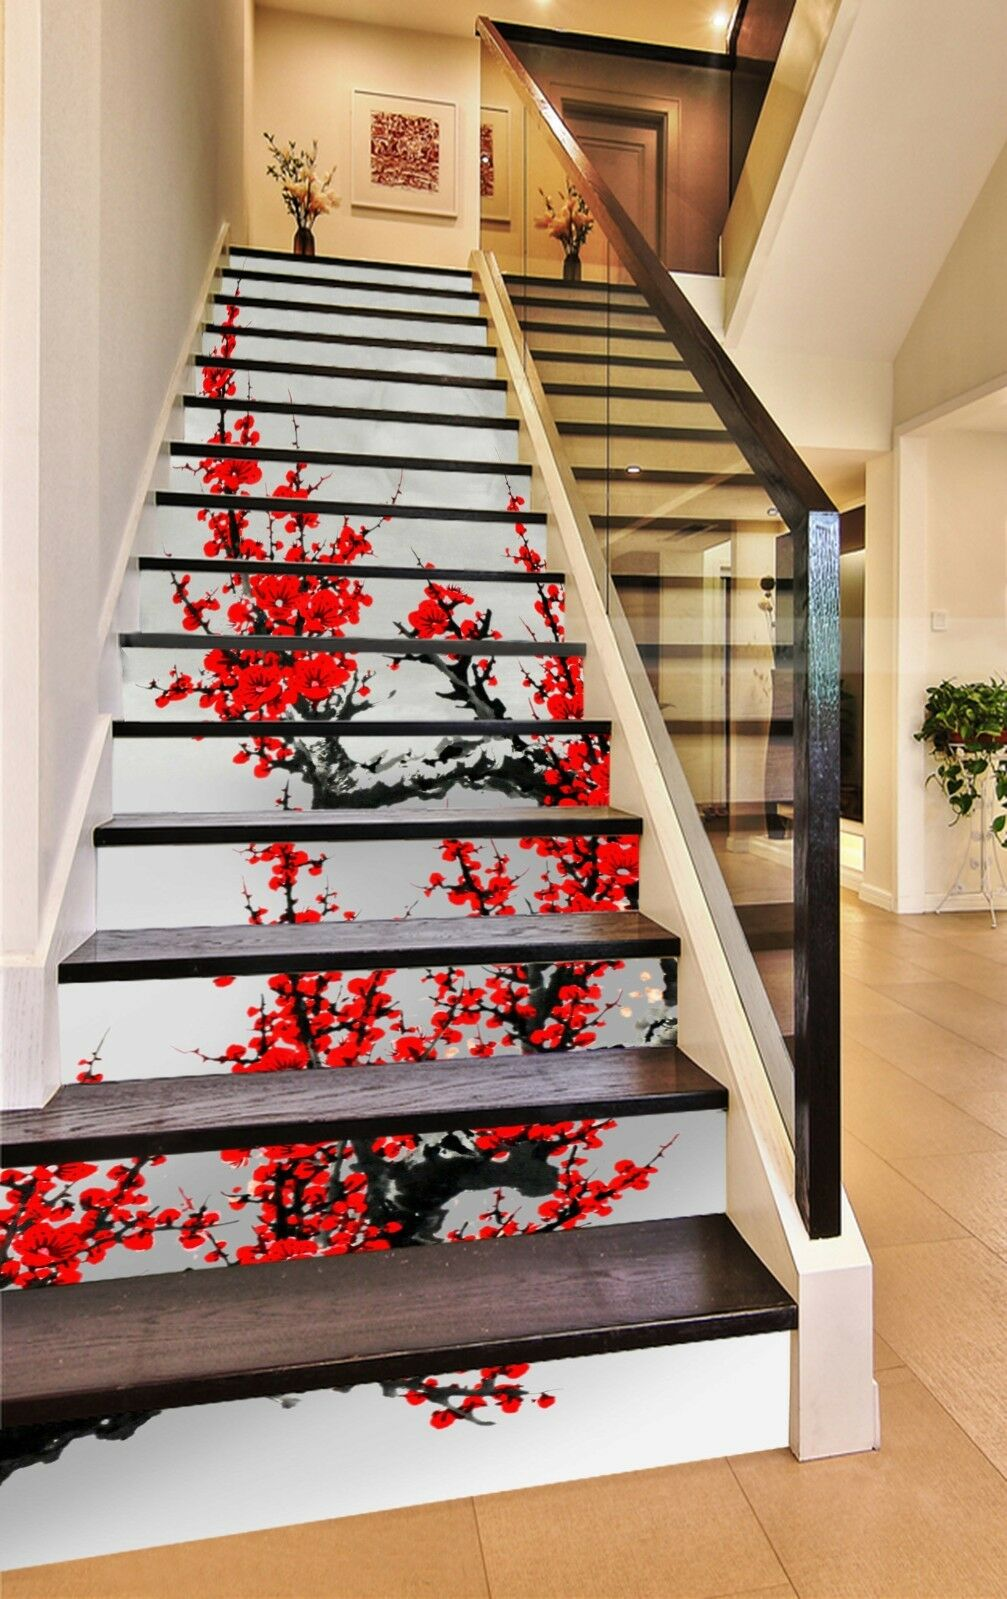 3D rouge plum blossom Stair Risers Decoration Photo Mural Vinyl Decal Wallpaper AU